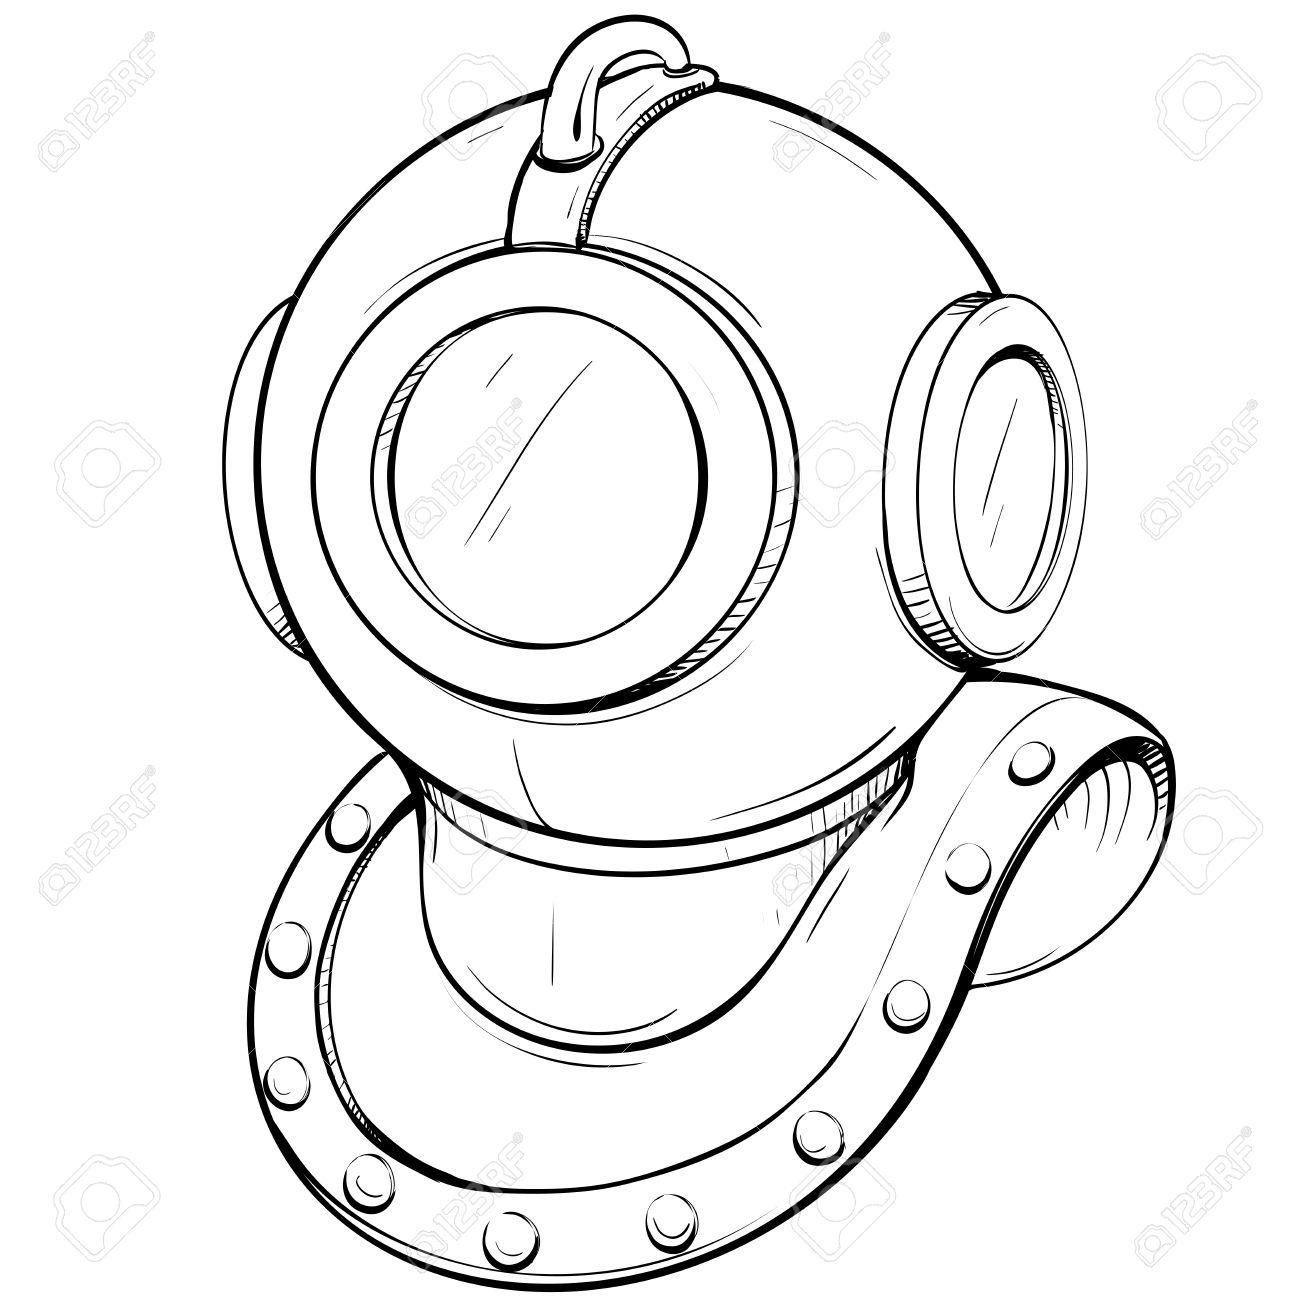 Vector Illustration Retro Diving Helmet Made In Thumbnail Style.